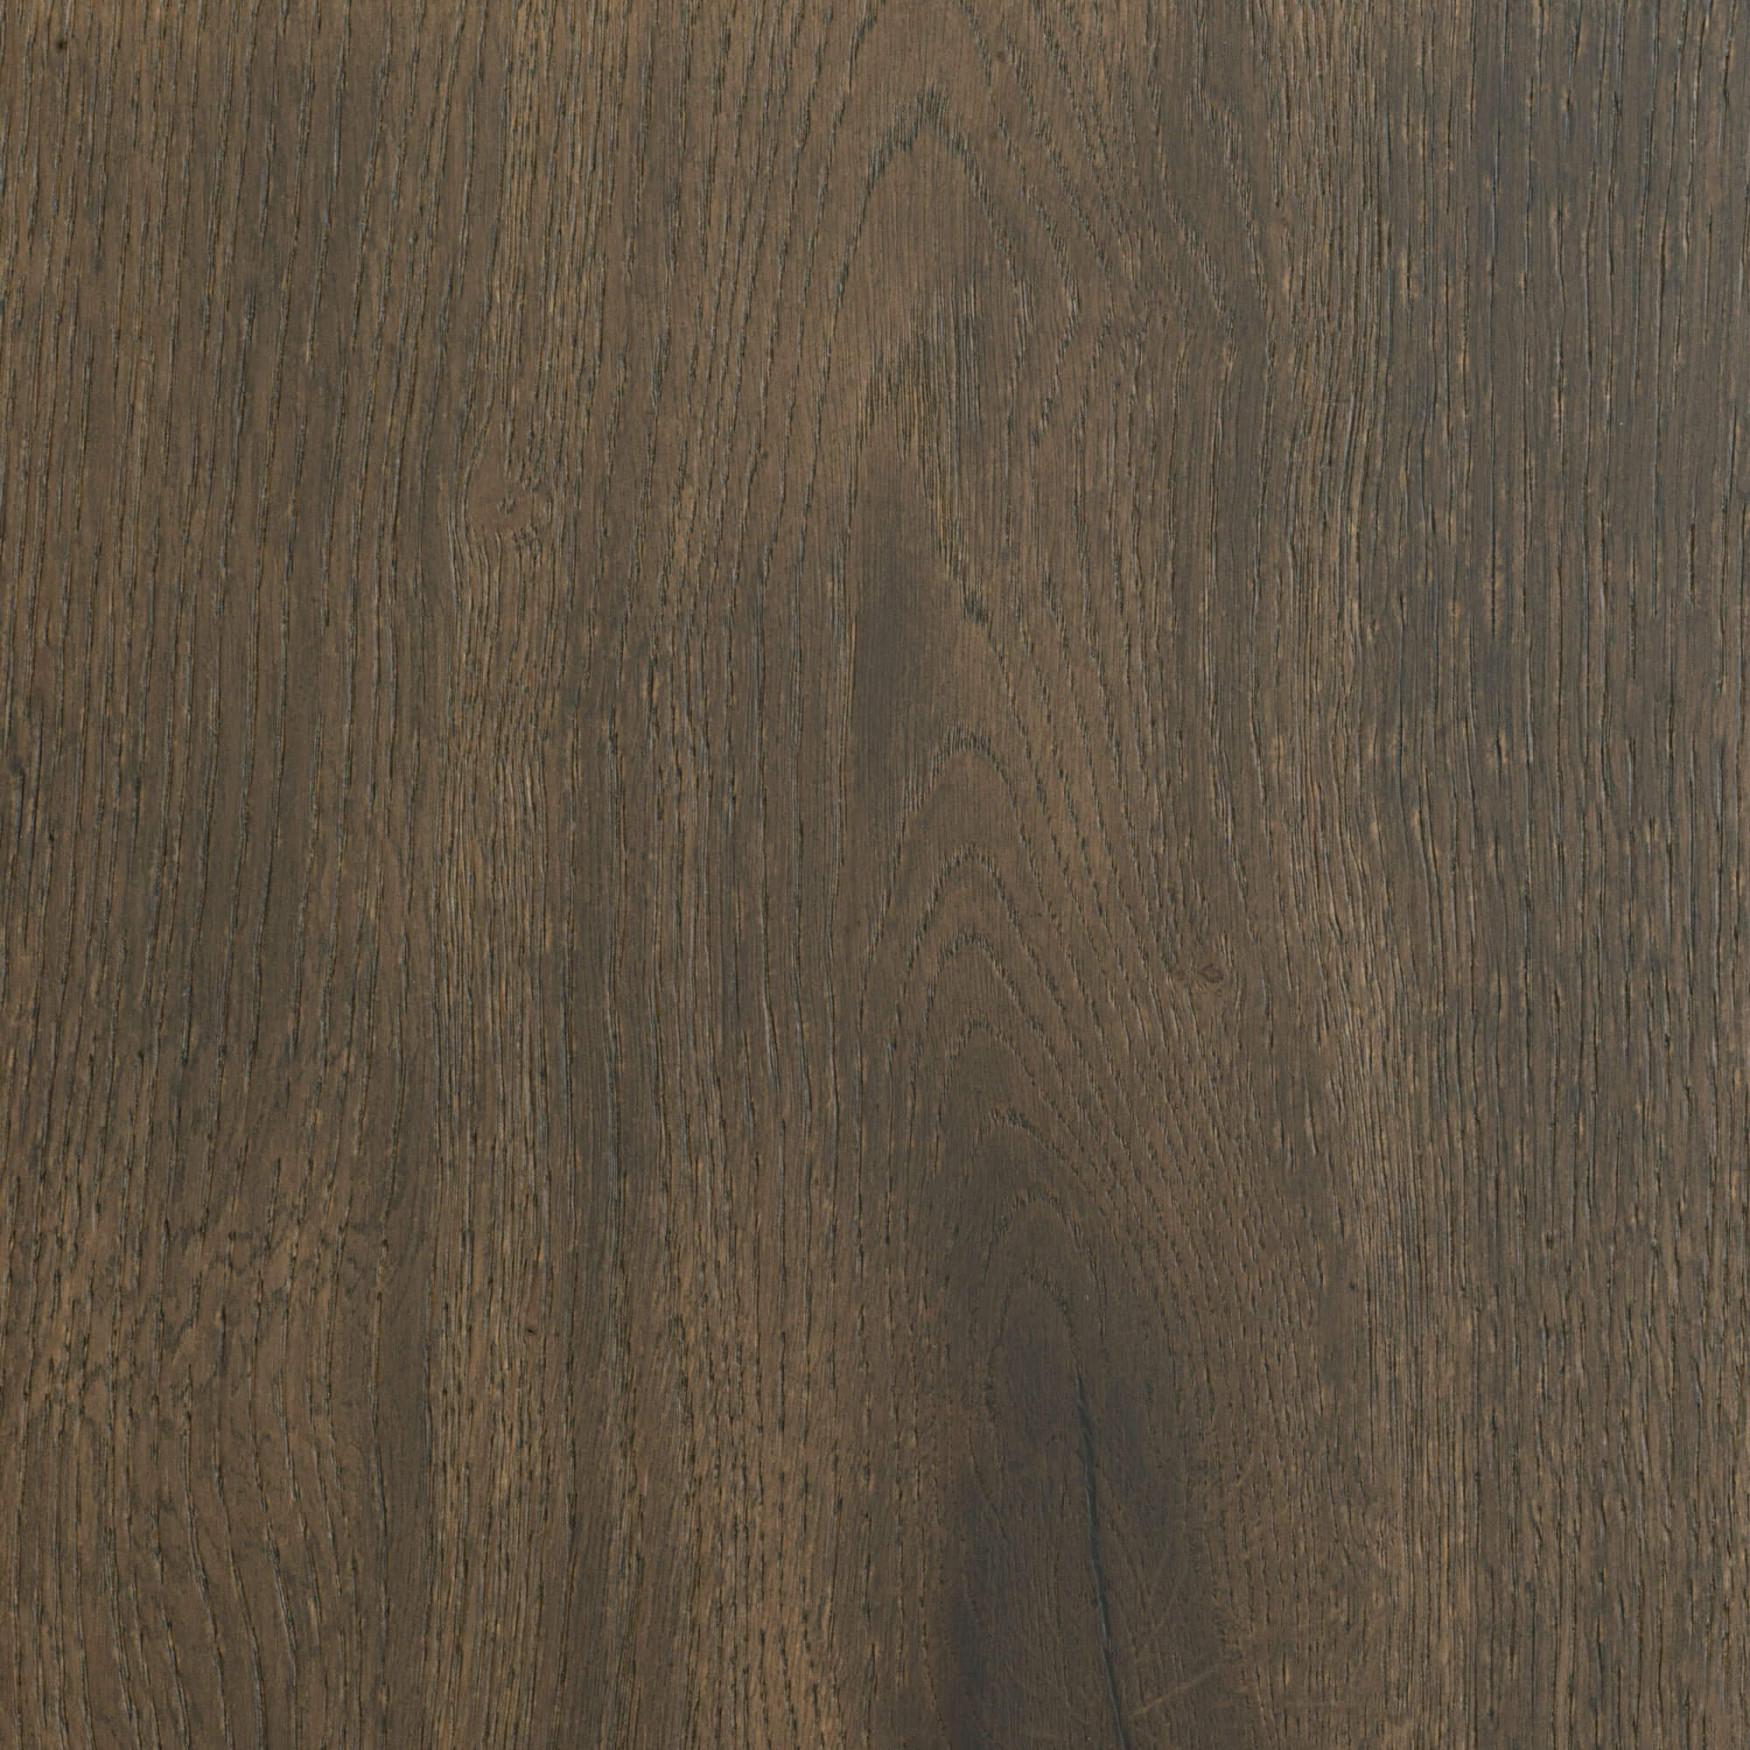 Element7-wide-plank-samples-RT-C-07v2